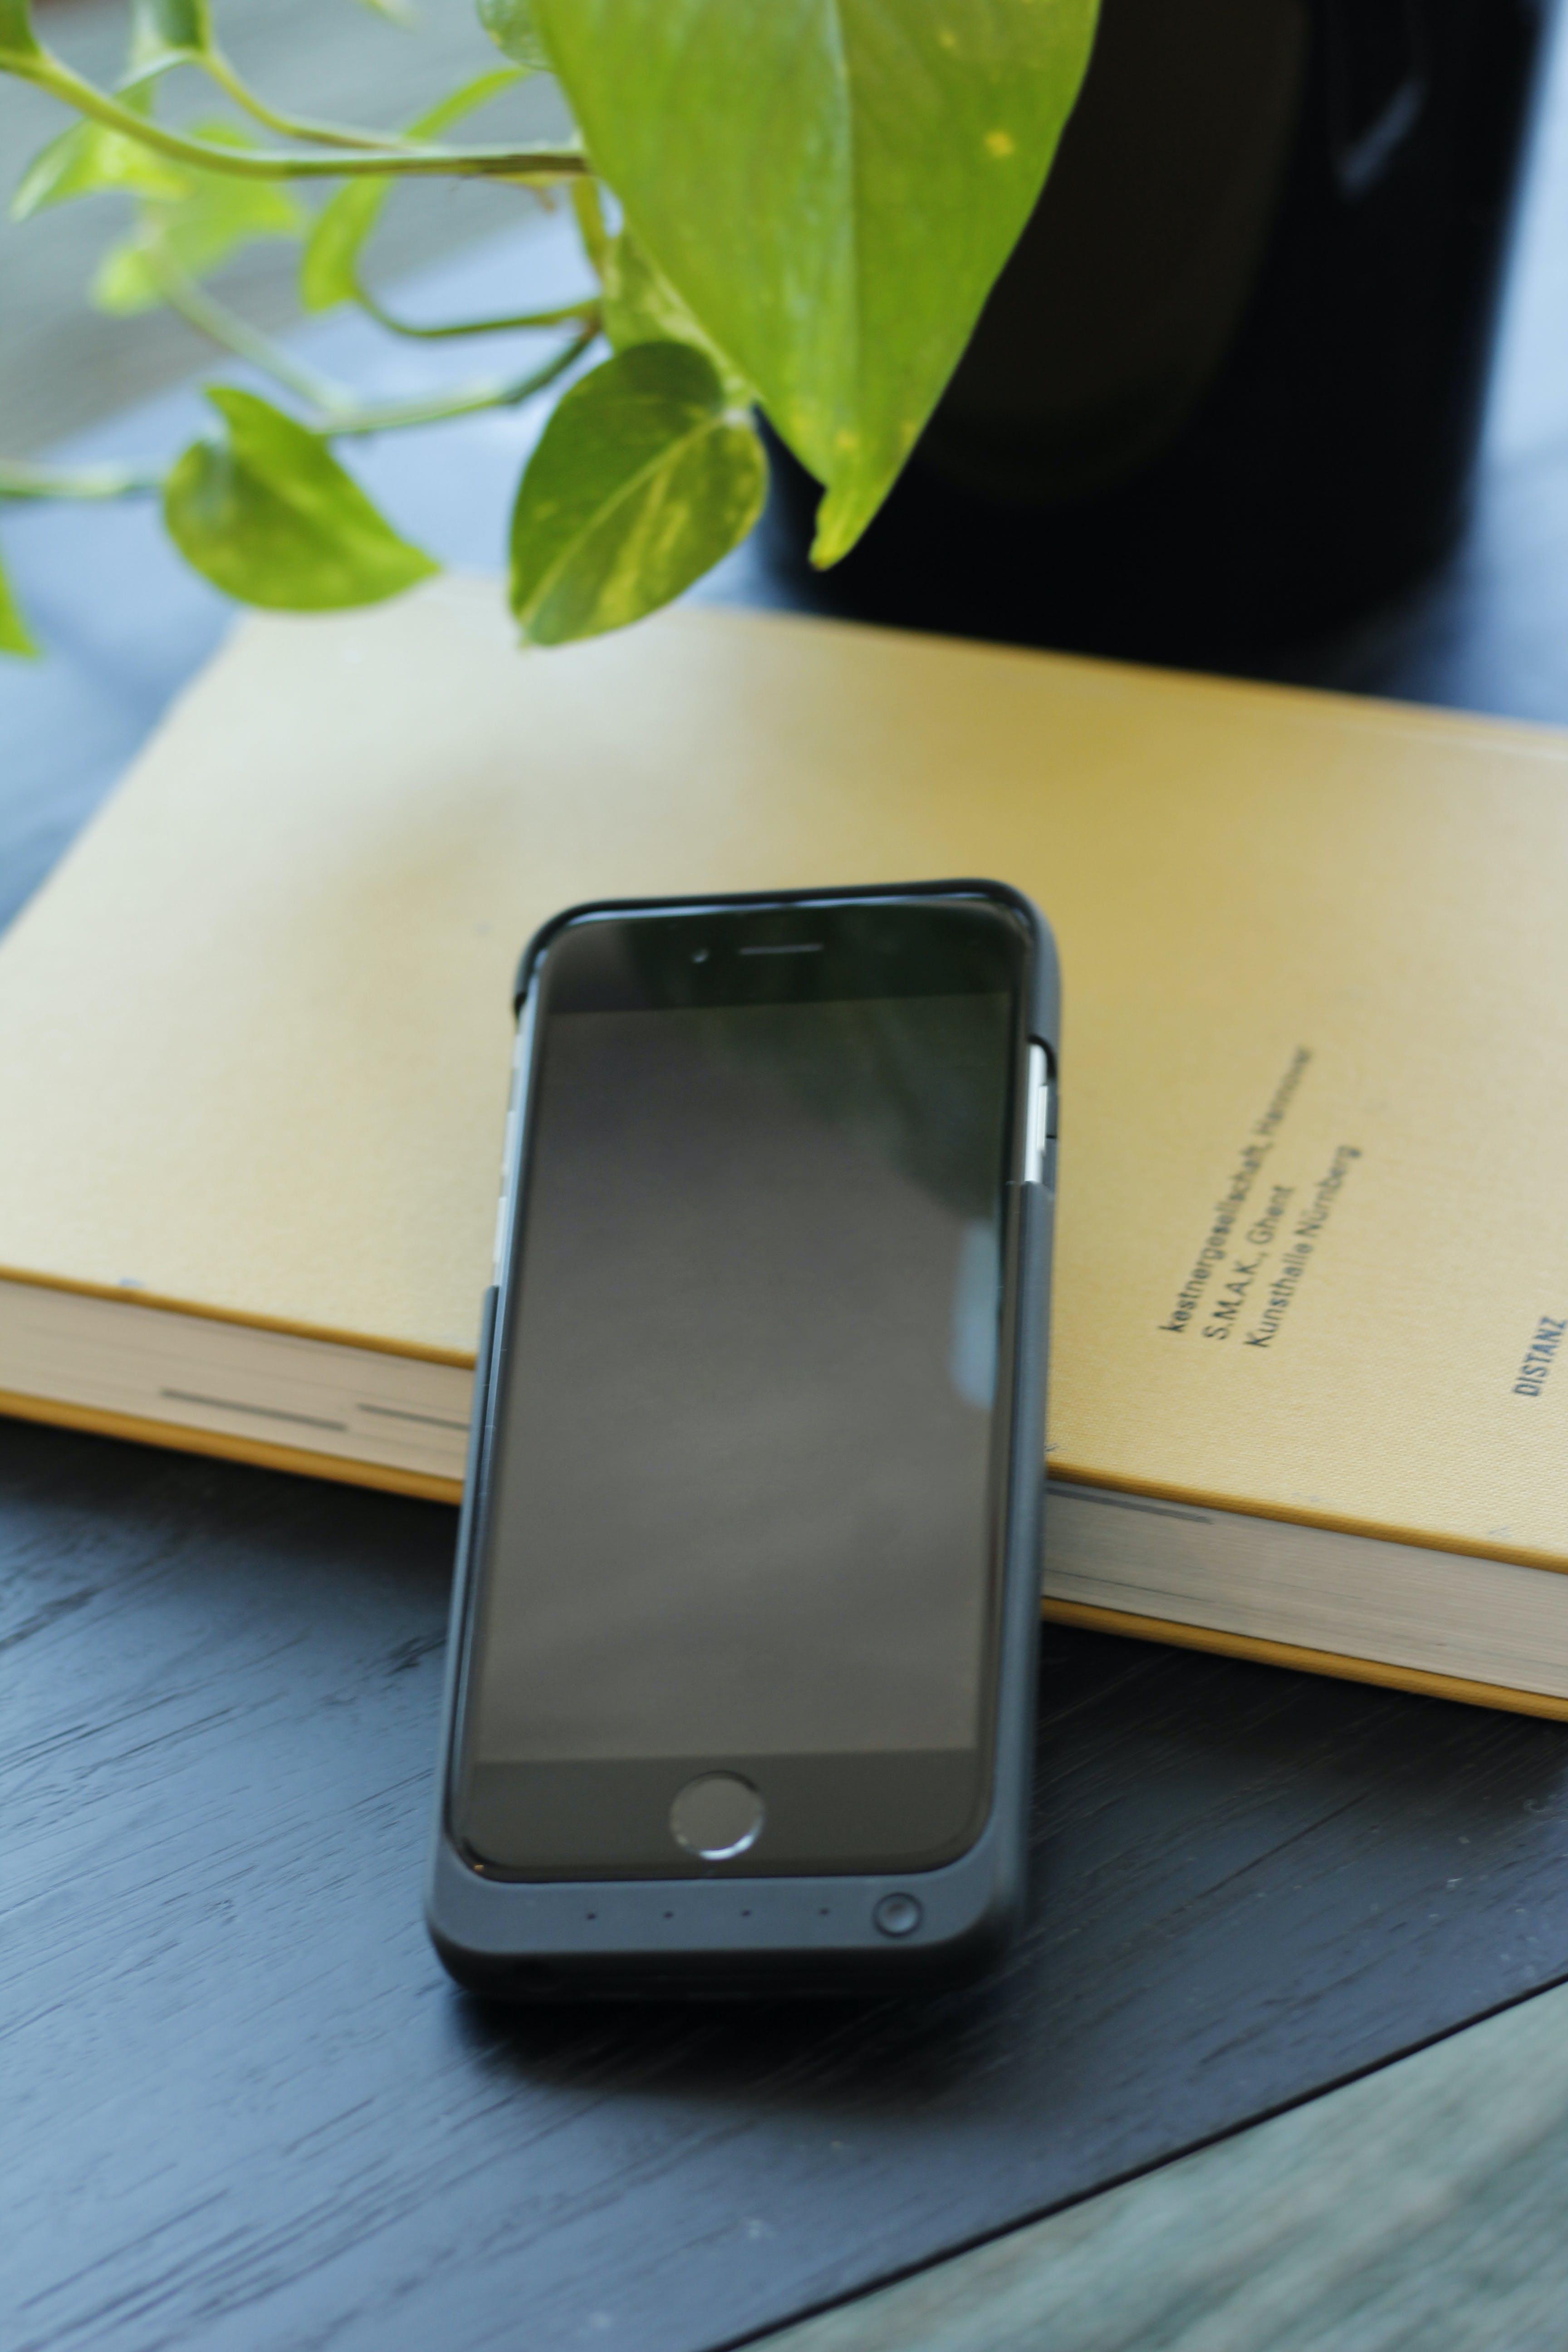 book, cell phone, celular